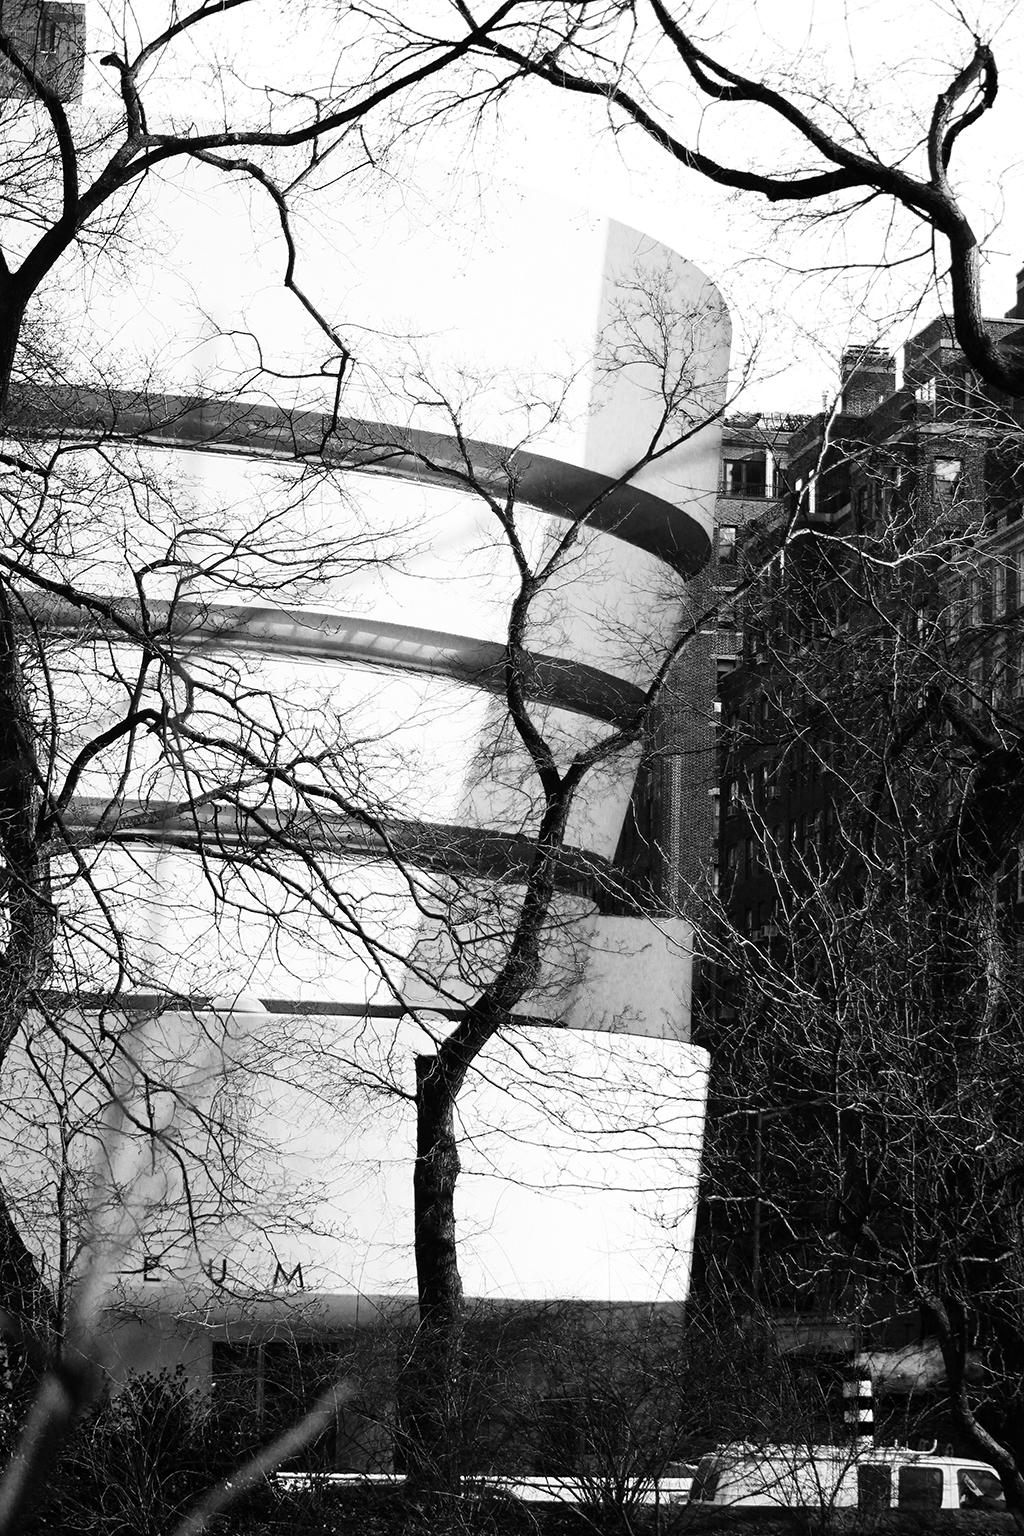 Guggenheim, NYC - Photo Essay by Amit Khanna (2).jpg